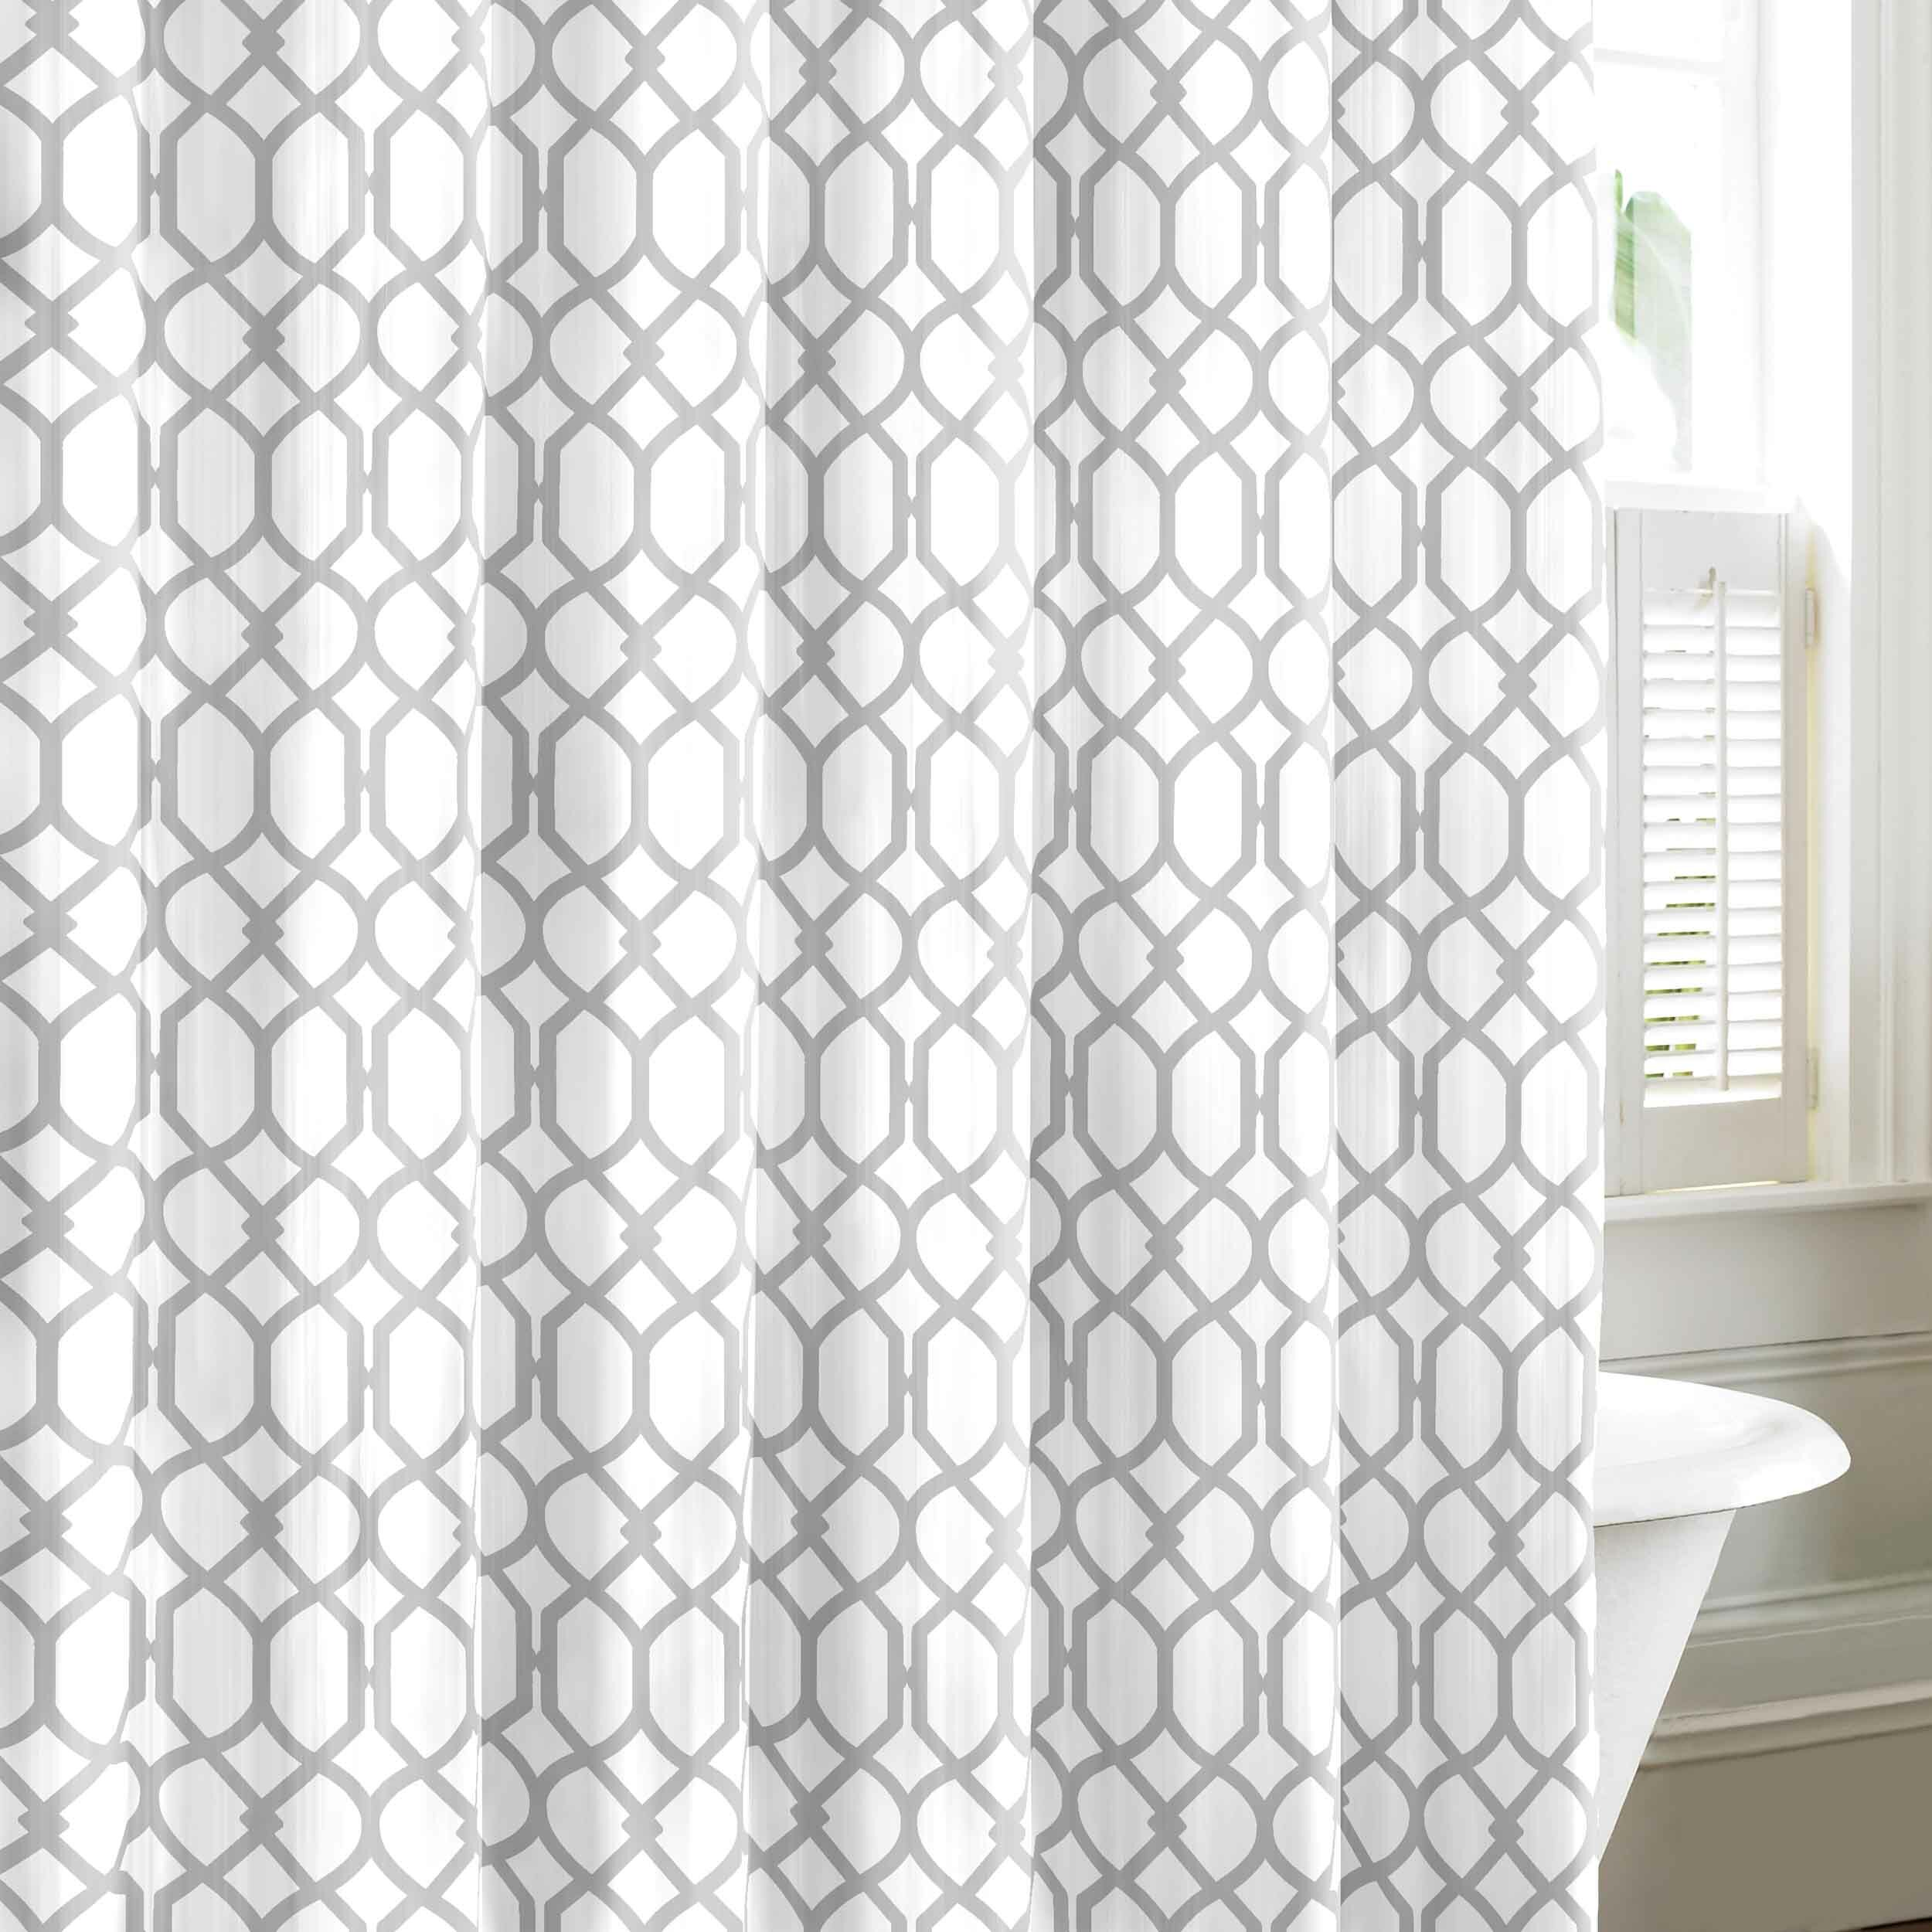 Polka dot shower curtain black and white - Quick View Shoretwon Trellis Cotton Shower Curtain